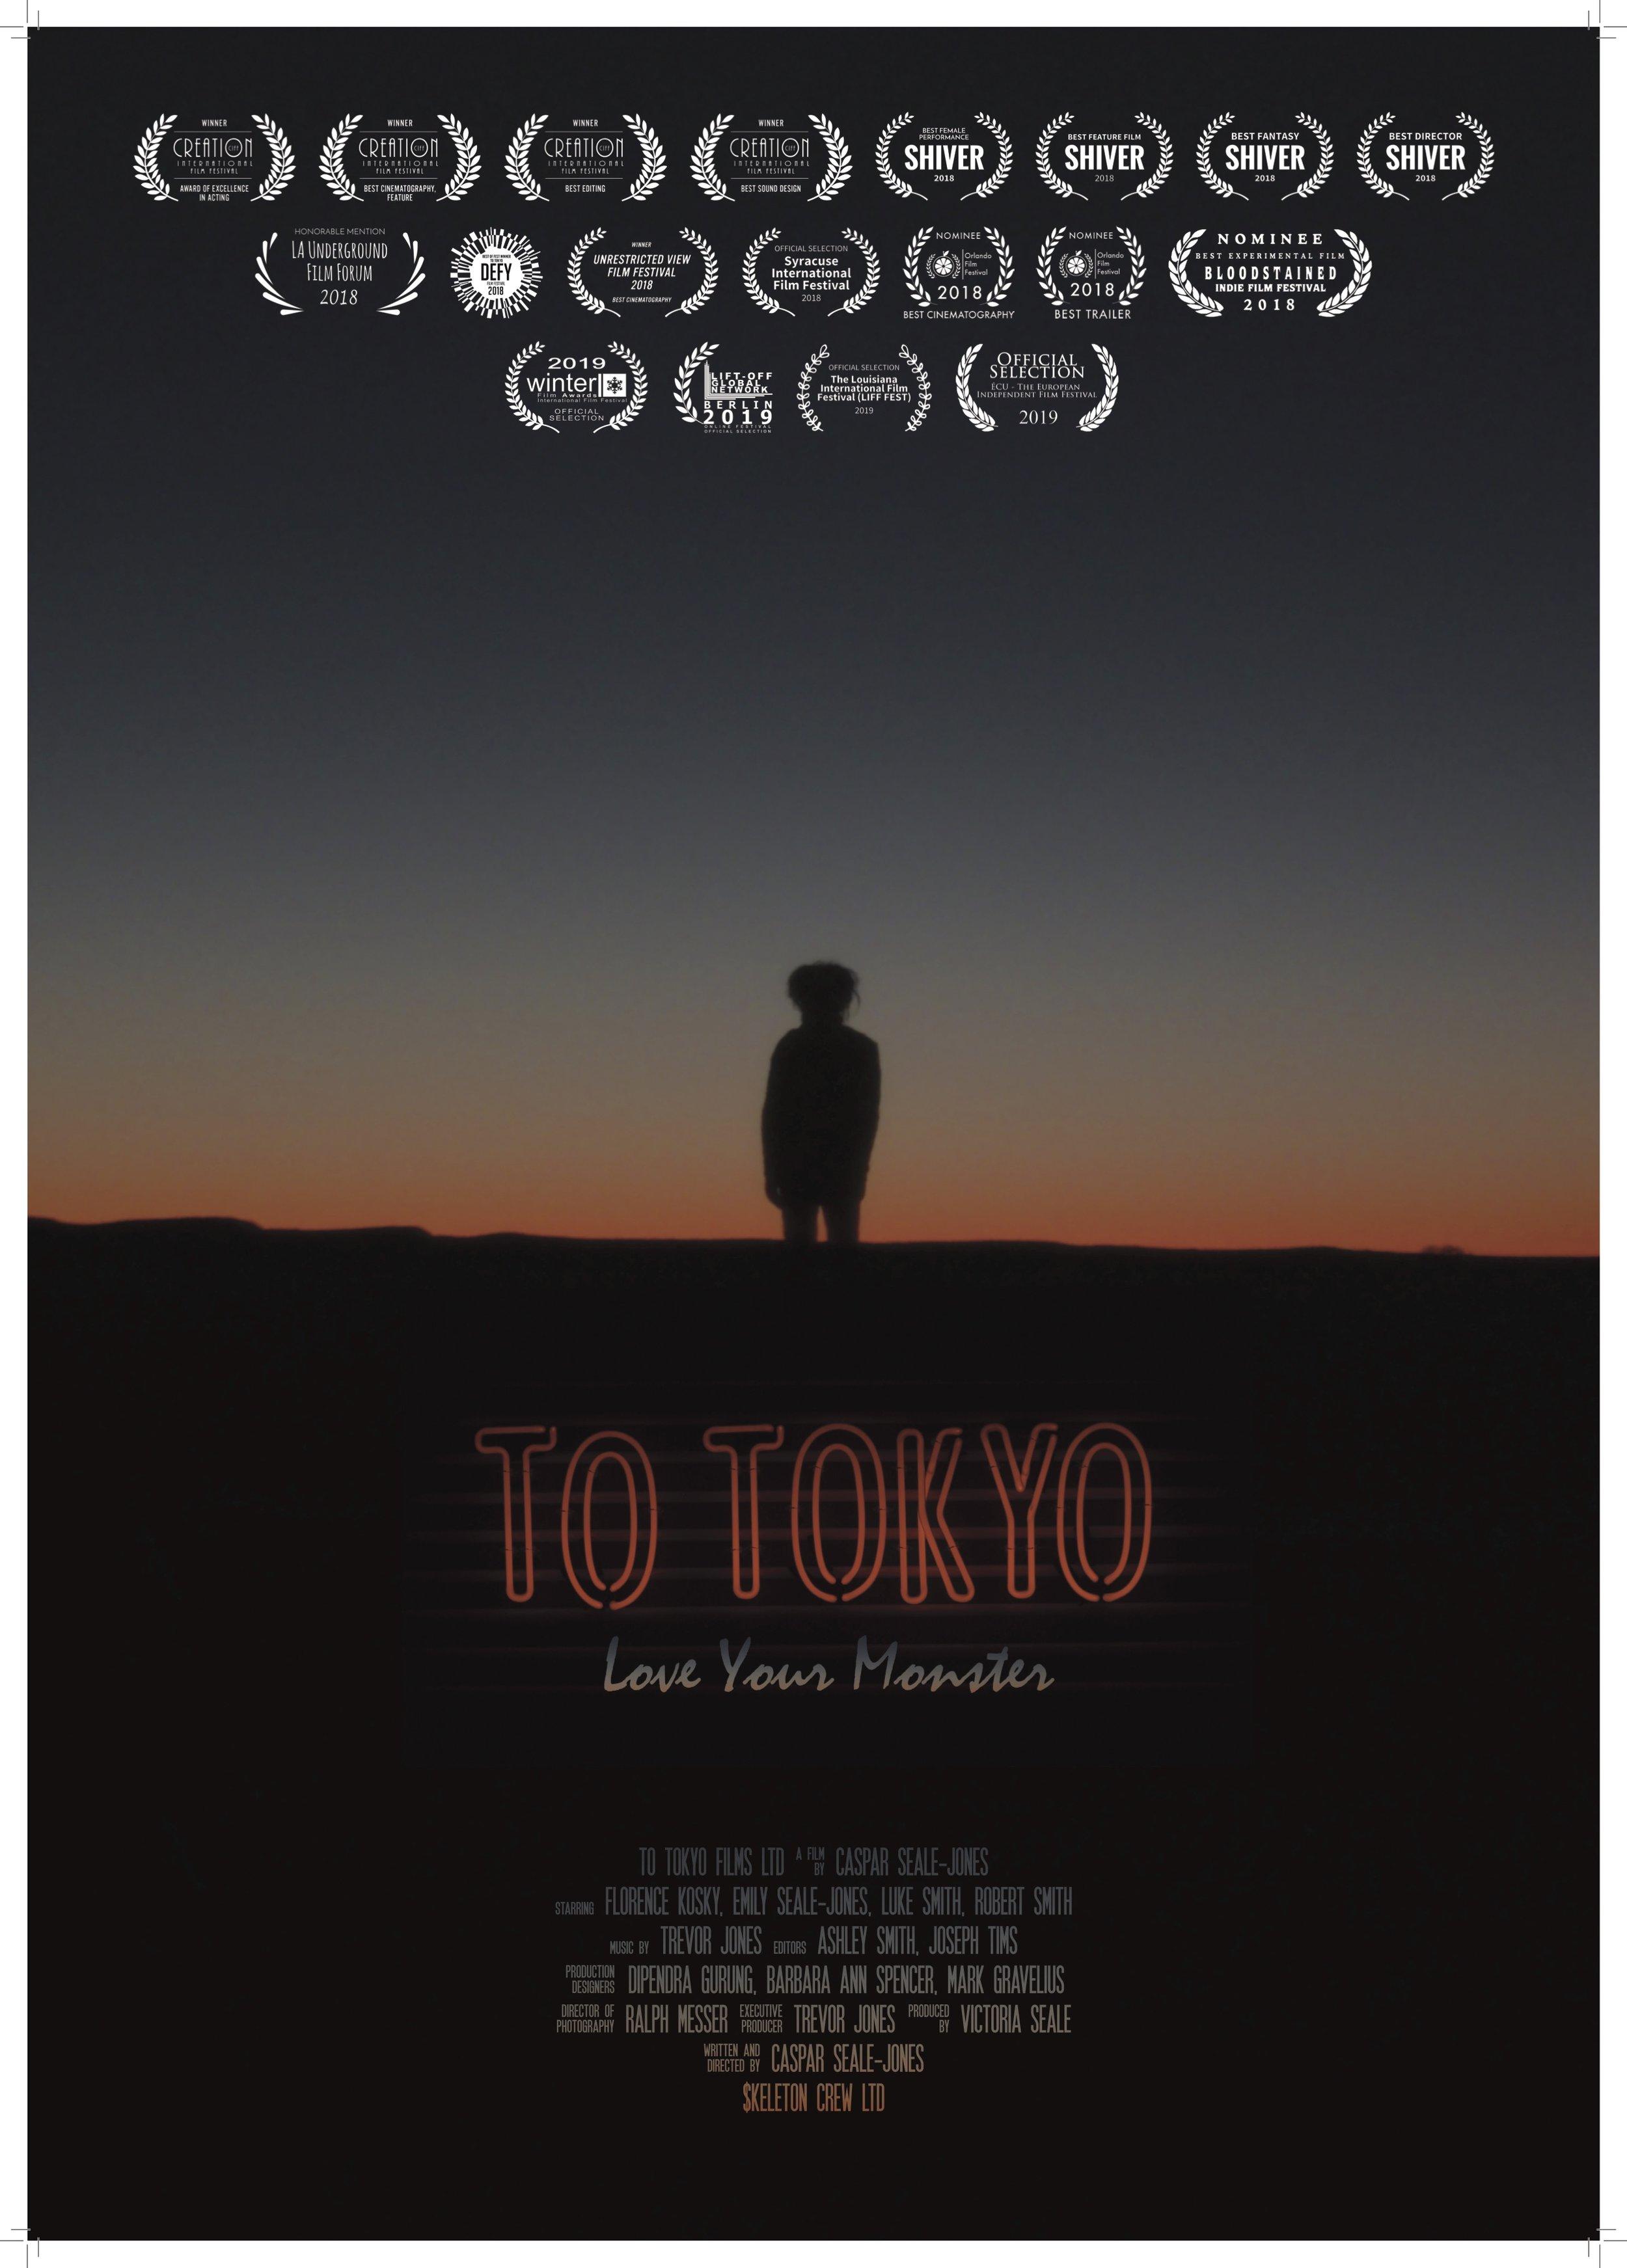 To Tokyo poster.jpg